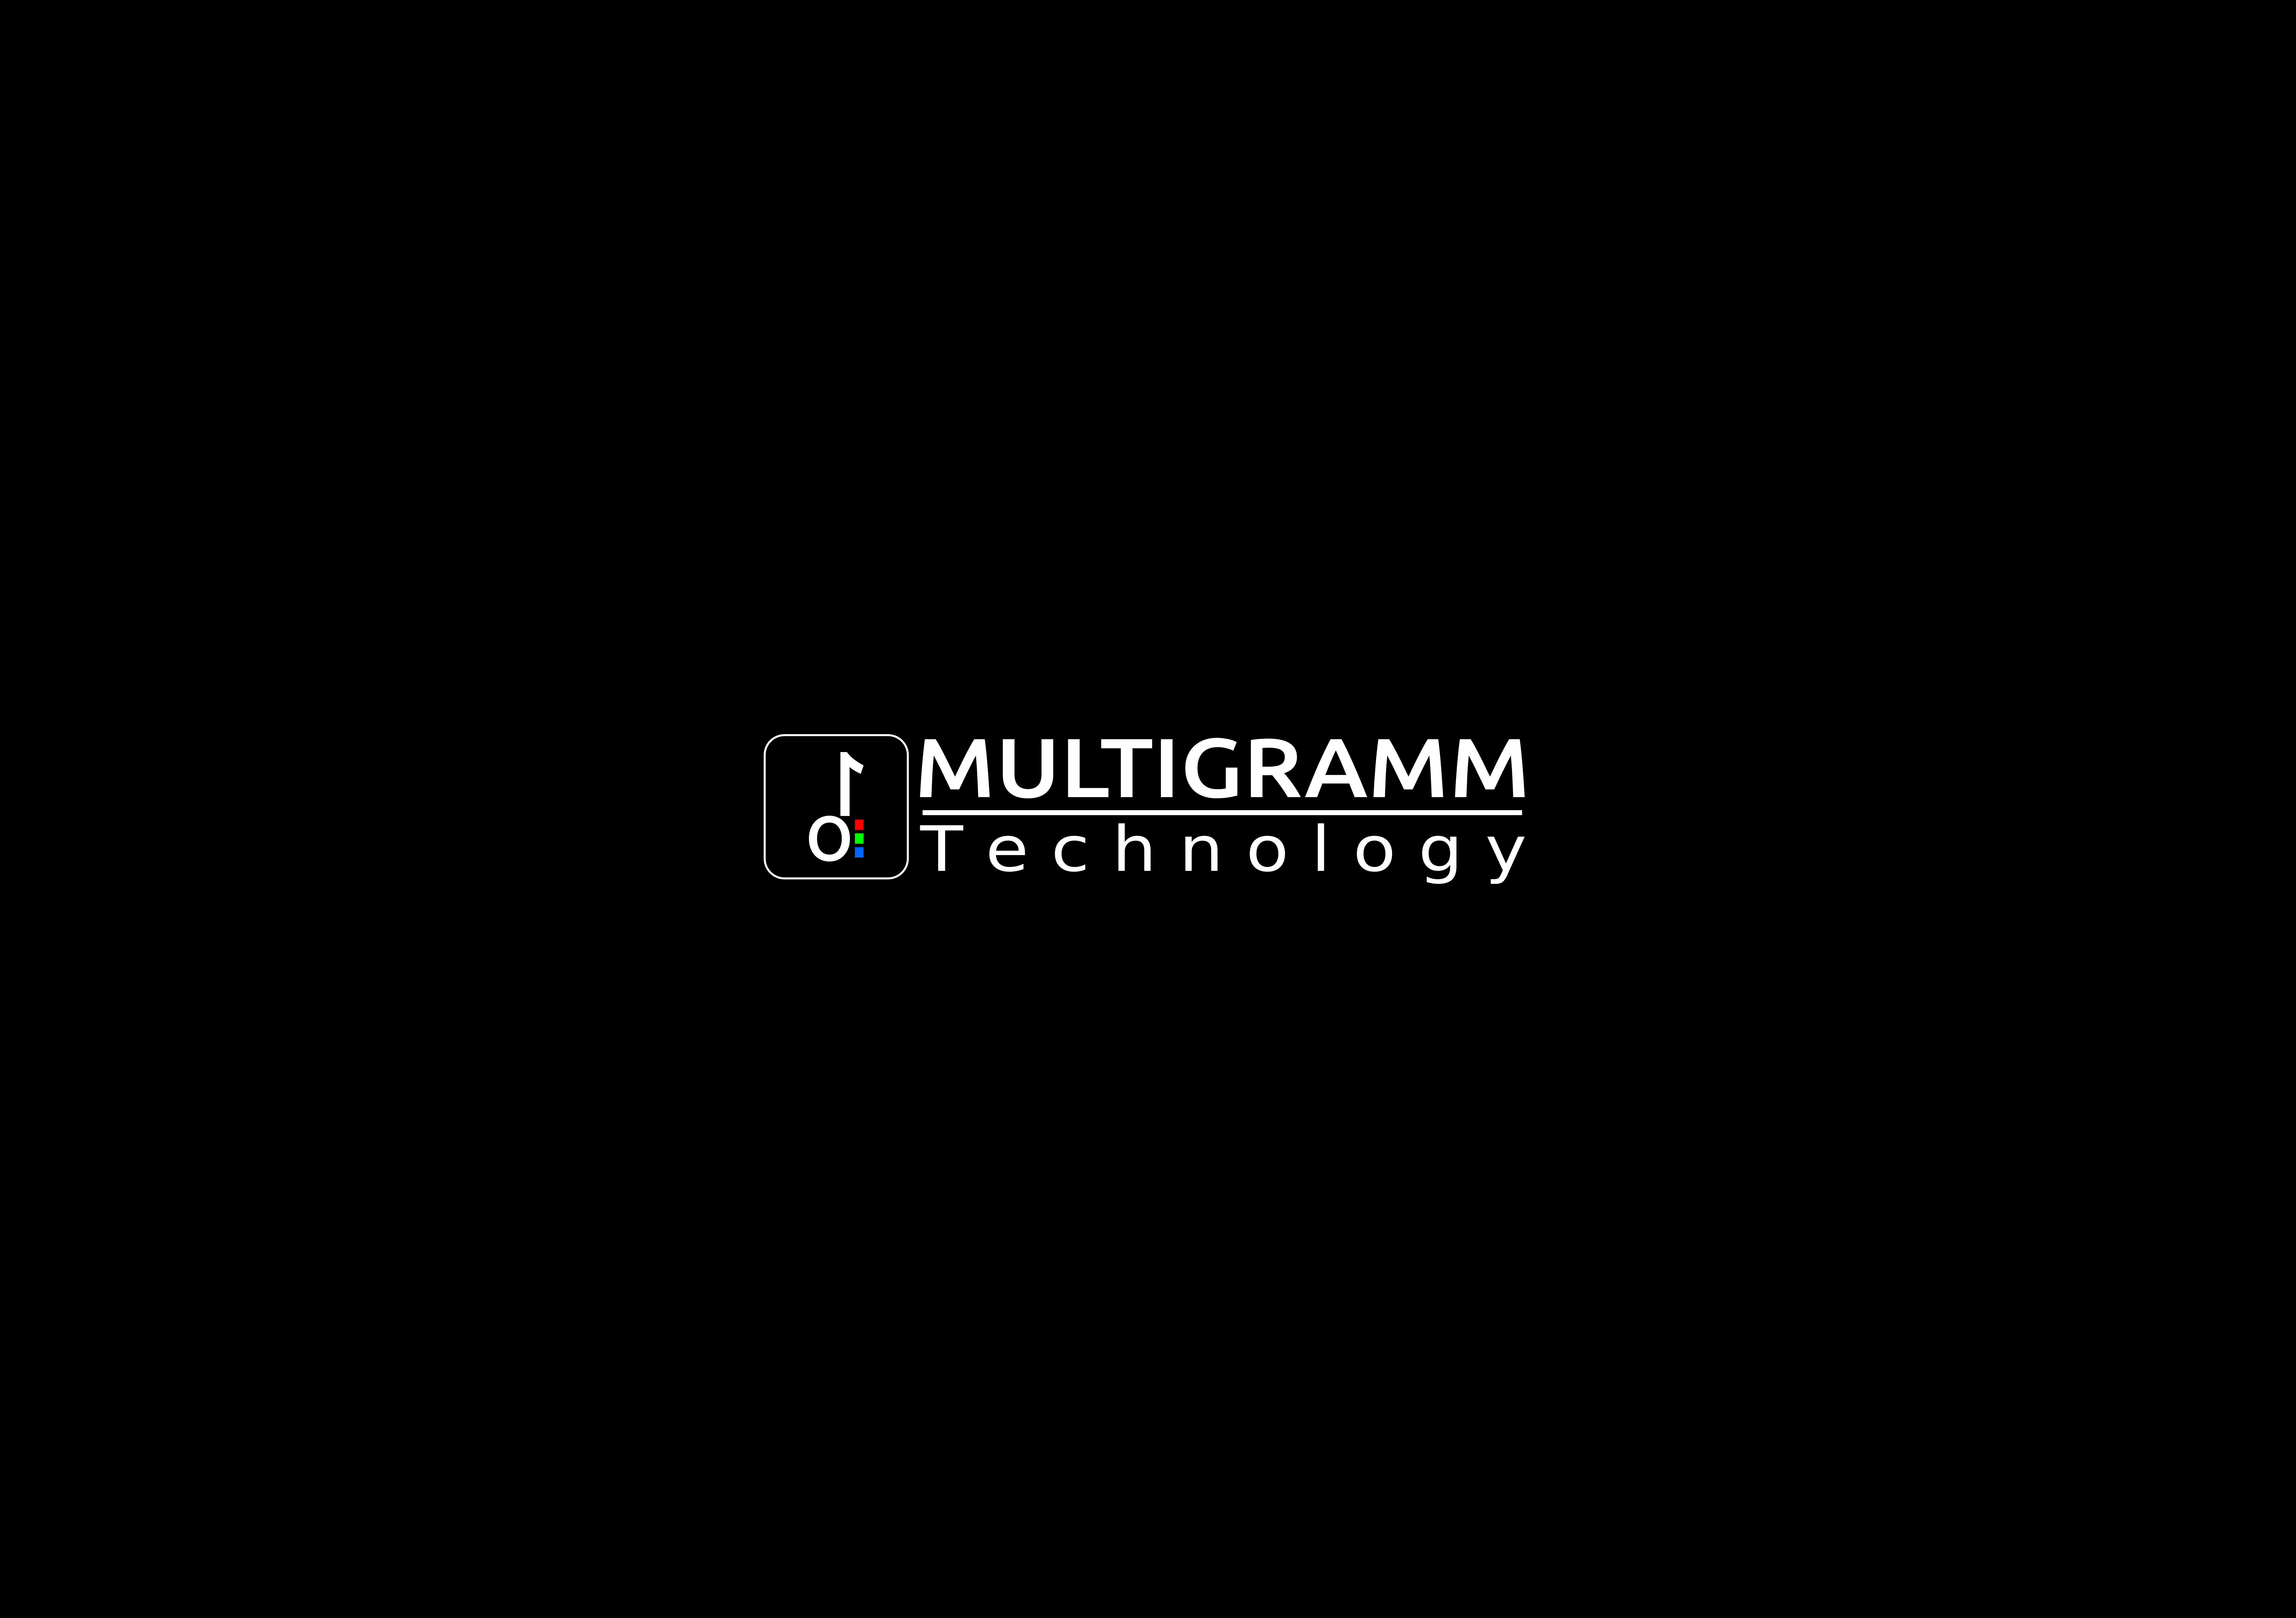 MULTIGRAMM Technology